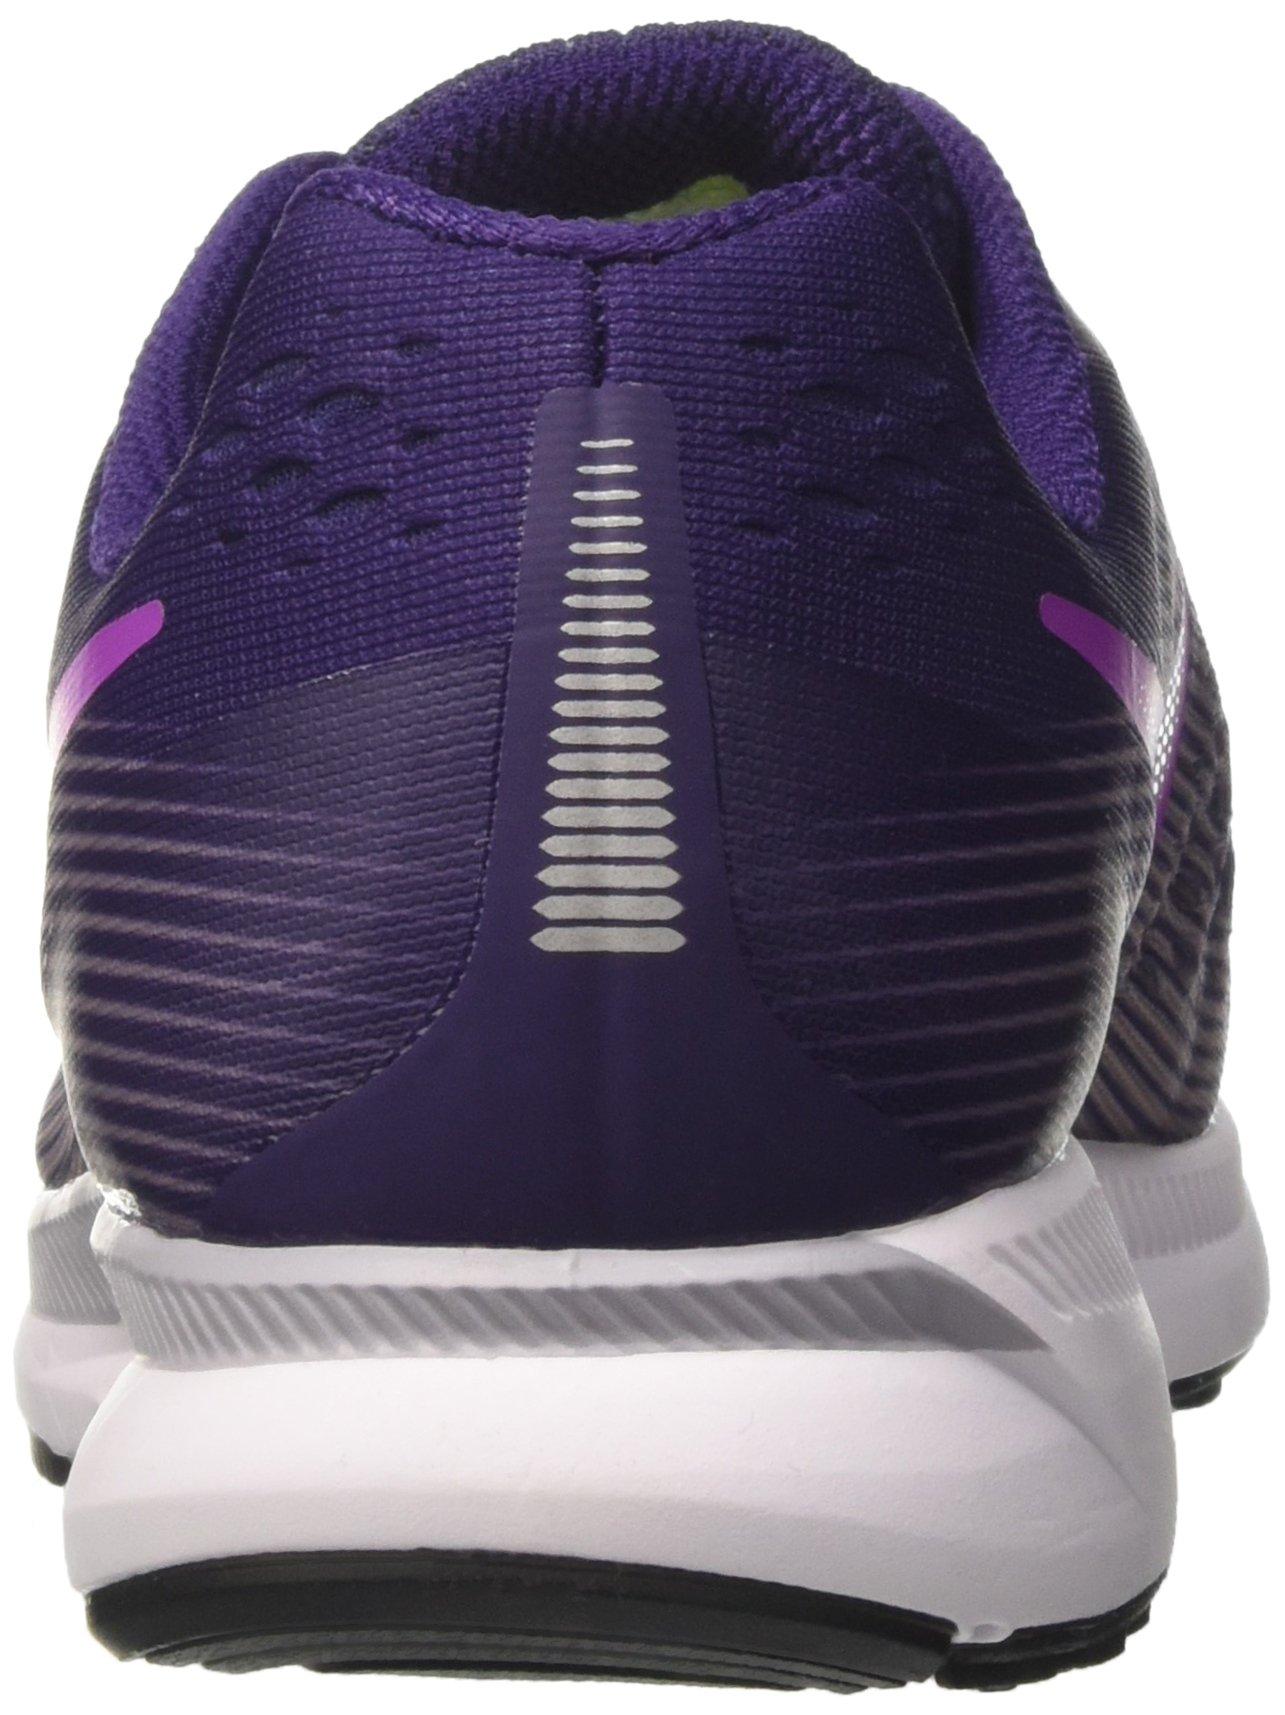 Nike Women's Air Zoom Pegasus 34 Running Shoes-Ink/Hyper Violet-6 by Nike (Image #2)